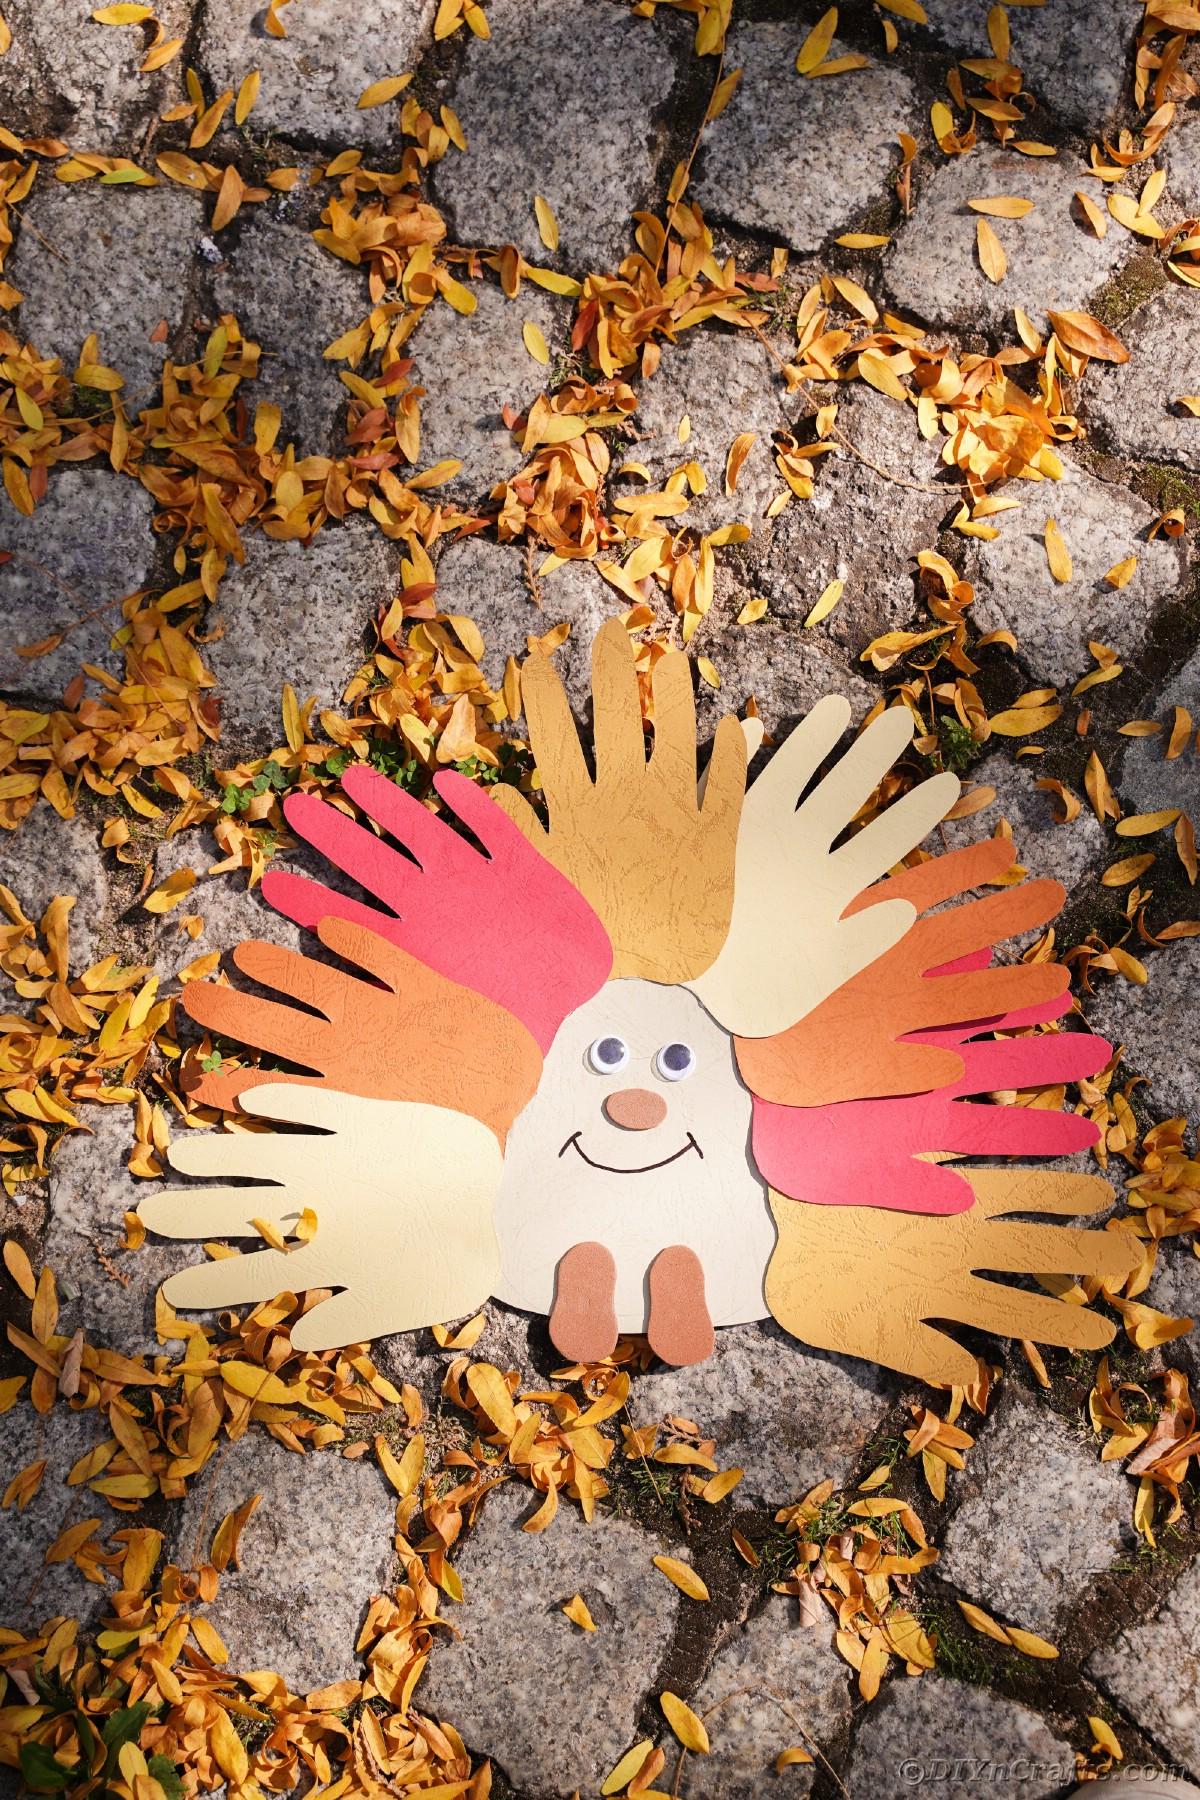 Yellow leaves on rocks by handpritn hedgehog